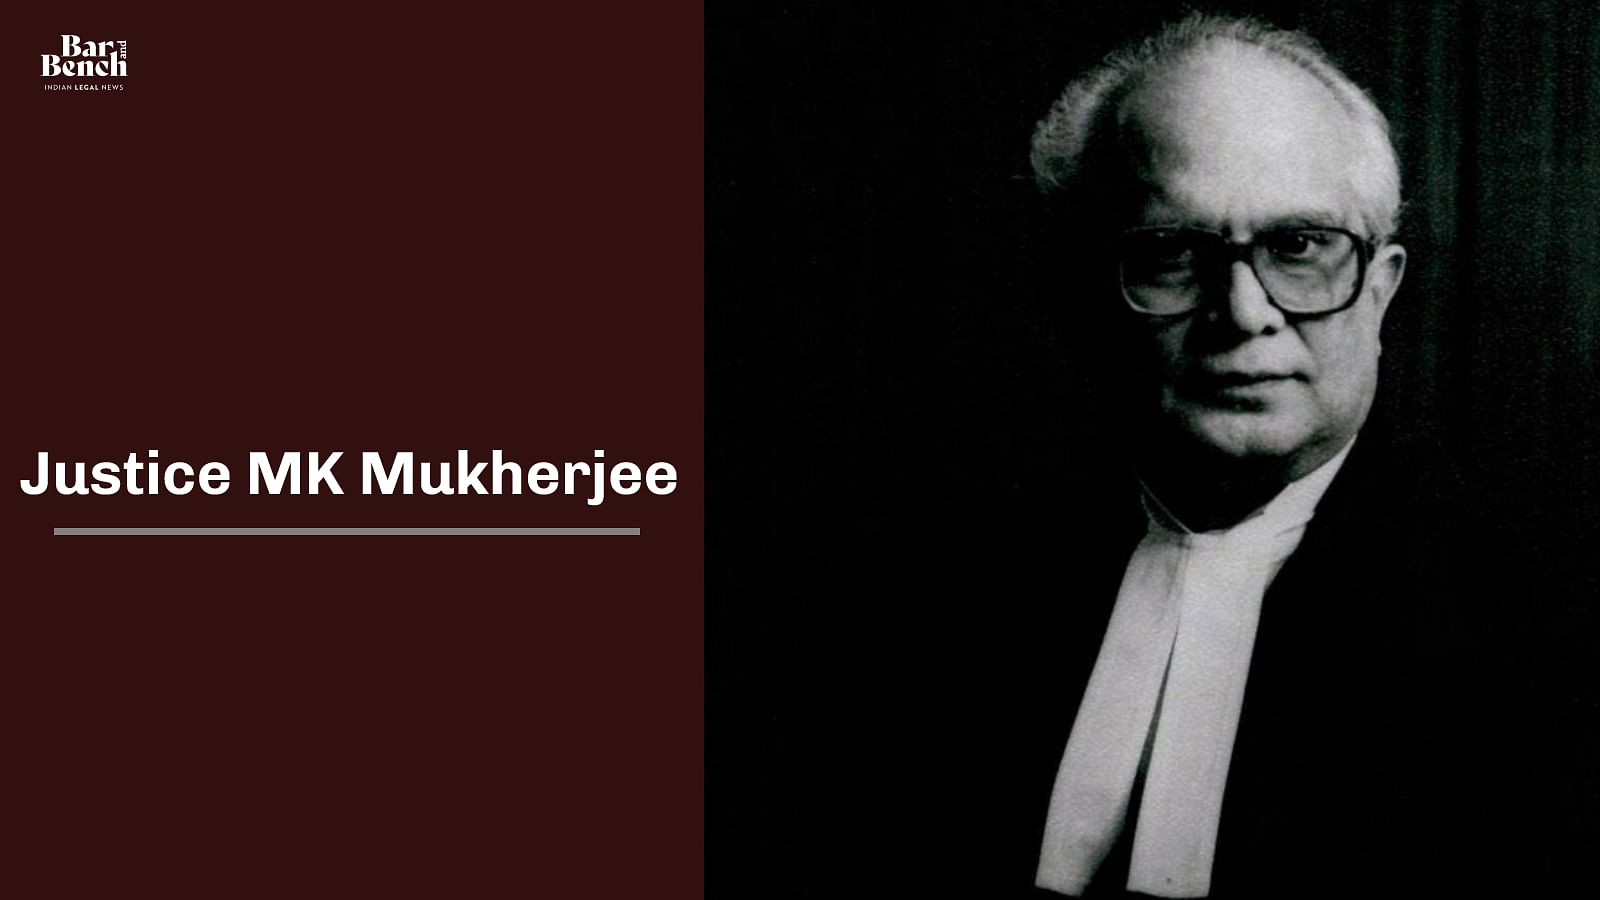 Justice MK Mukherjee